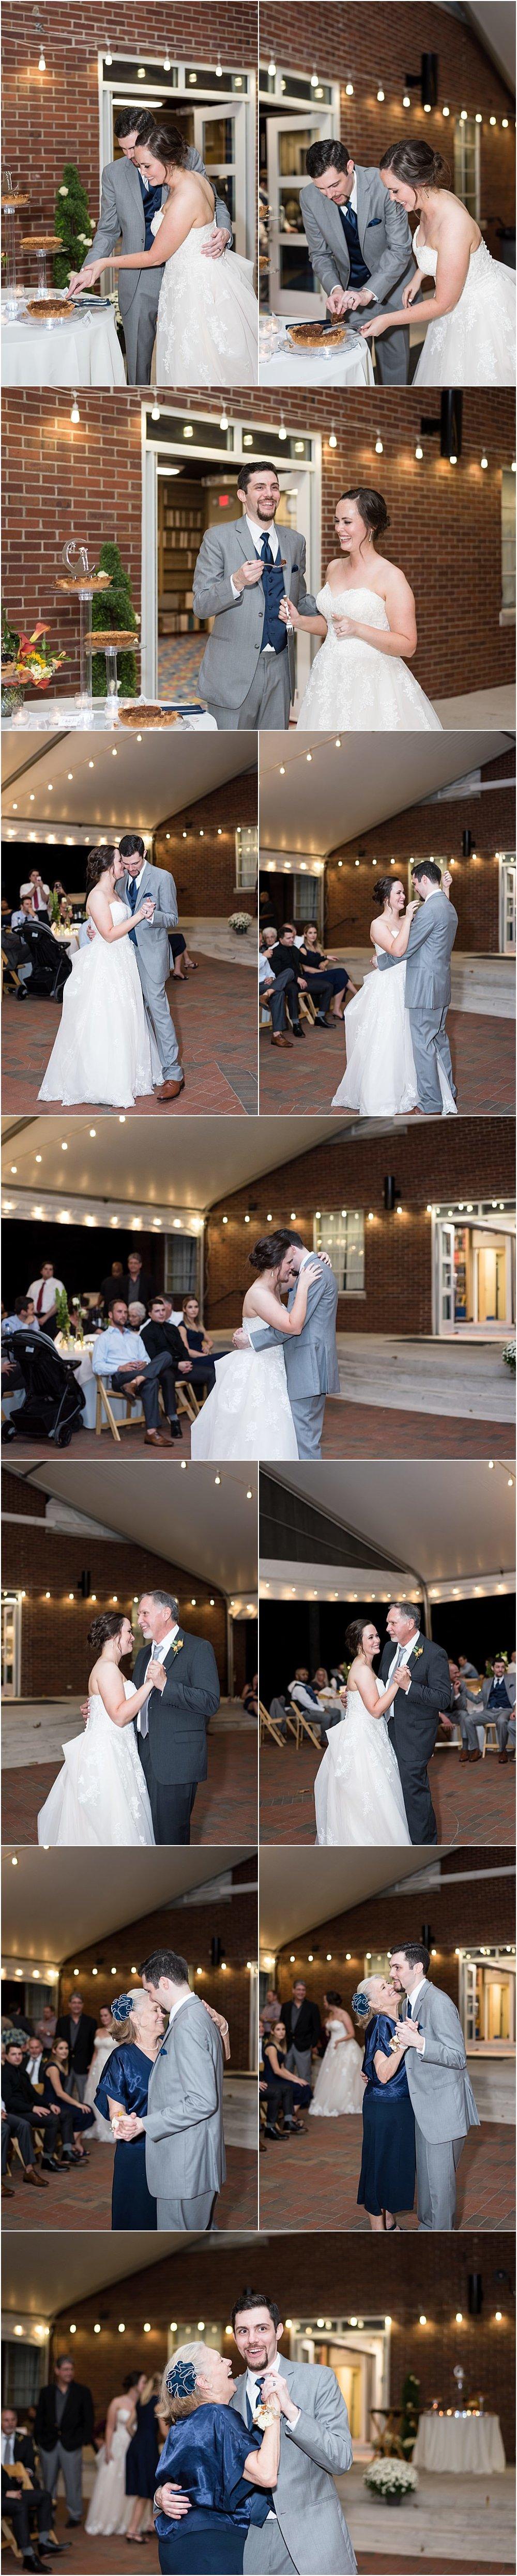 Nolan-And-Leanna-Vanderbilt-Dyer-Observatory-Wedding-in-Brentwood-TN-Nashville-Wedding-Photographers+9